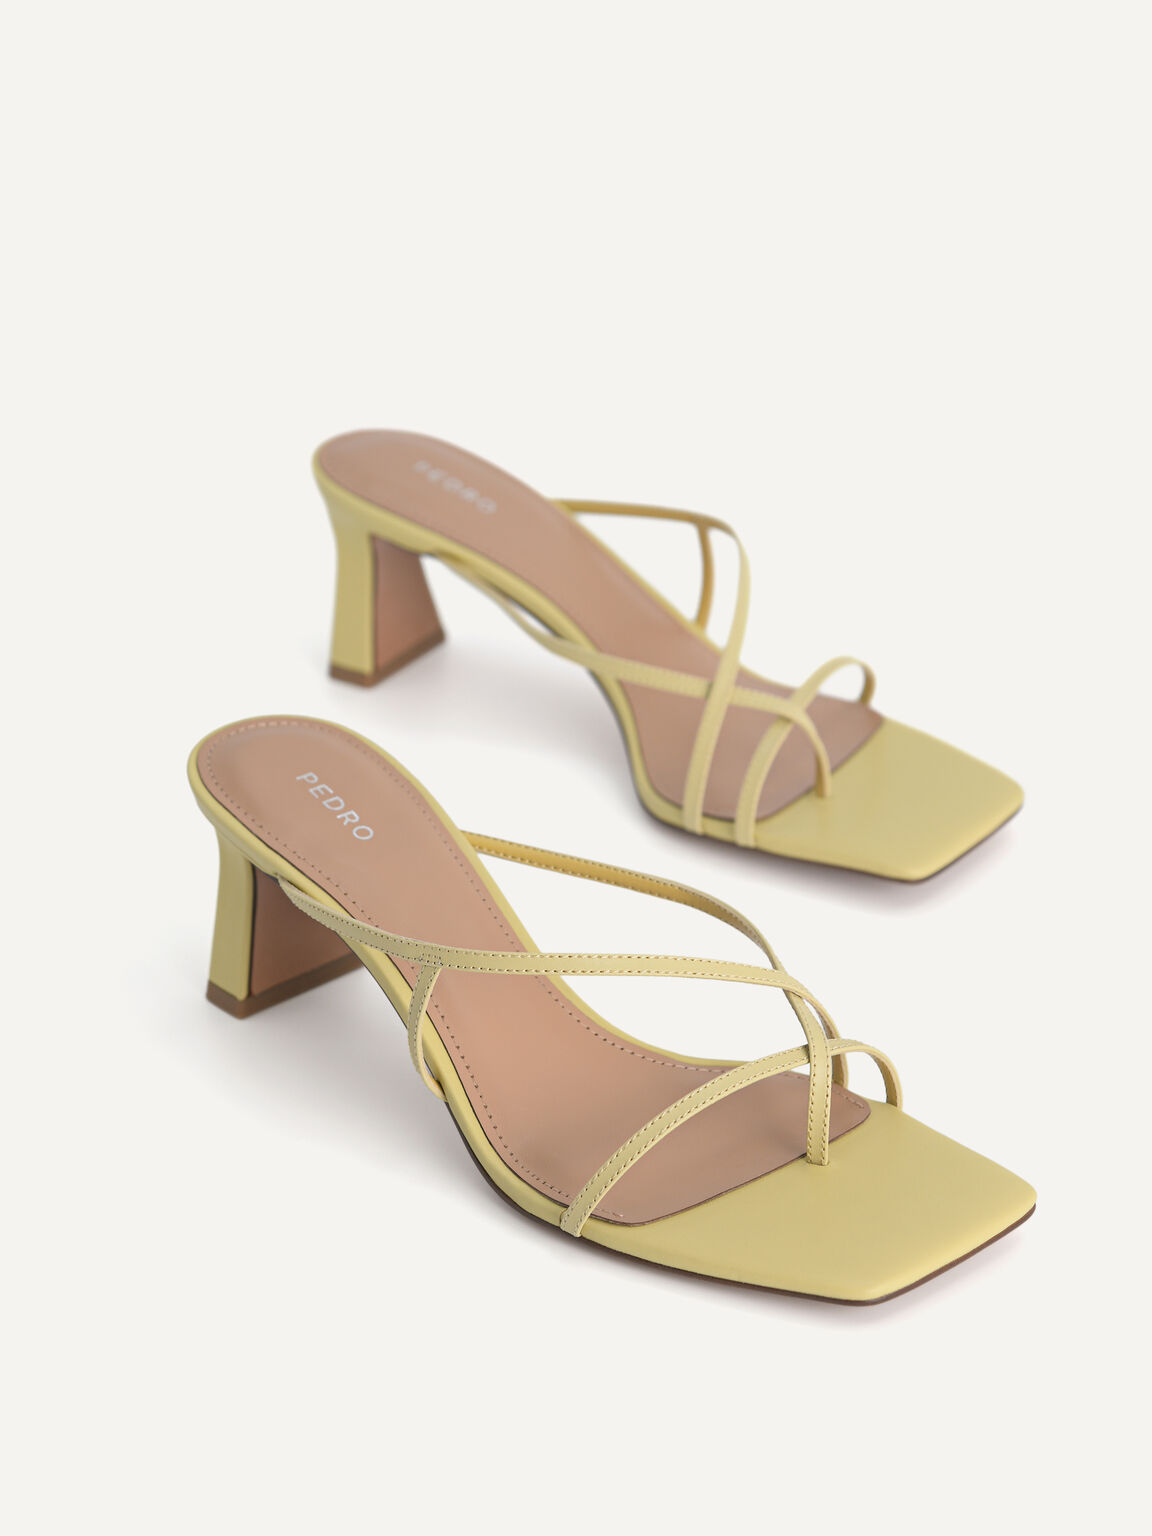 Strappy Toe Loop Heeled Sandals, Light Green, hi-res